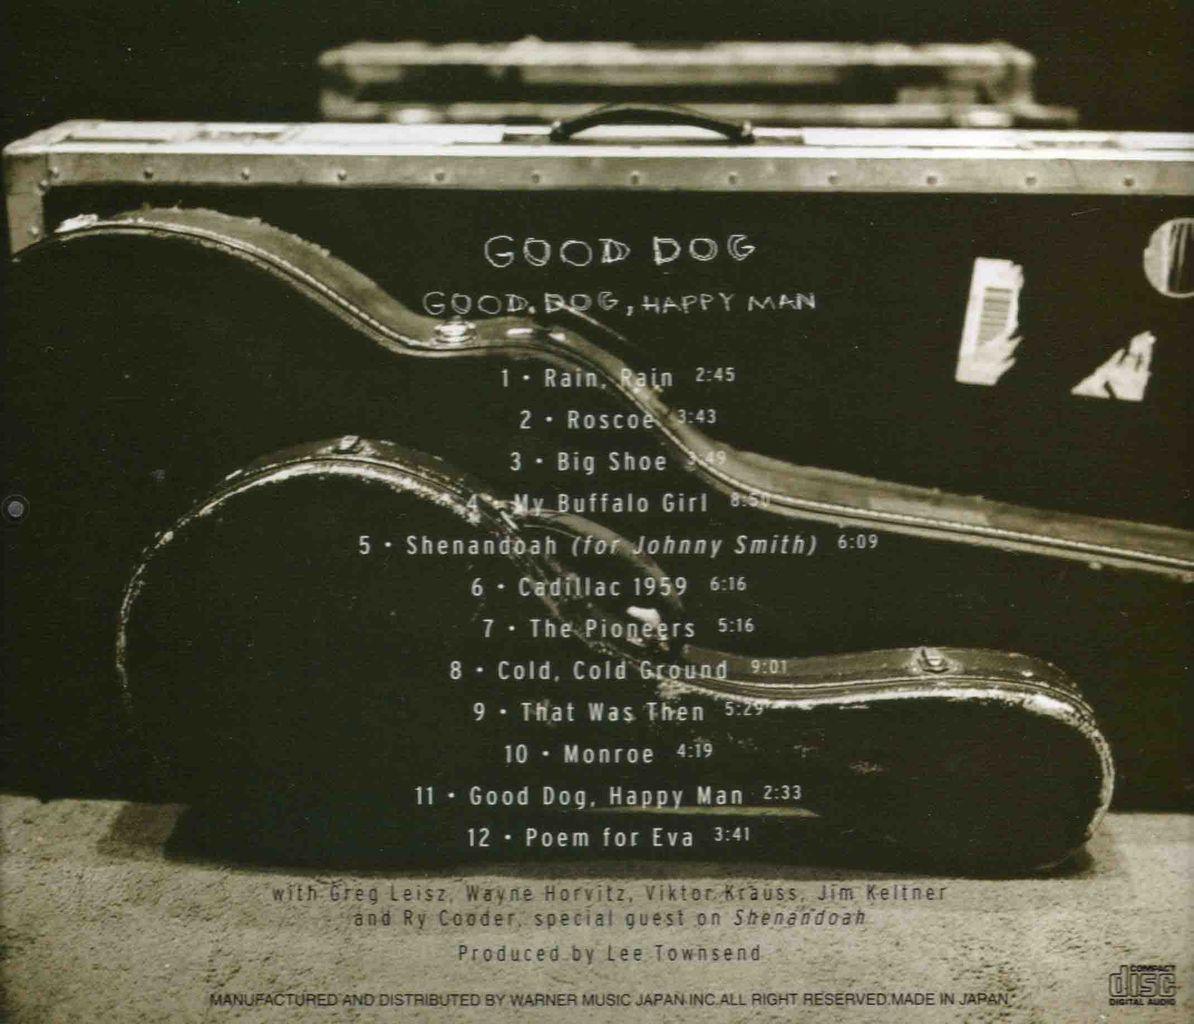 GOOD DOG, HAPPY MAN-4